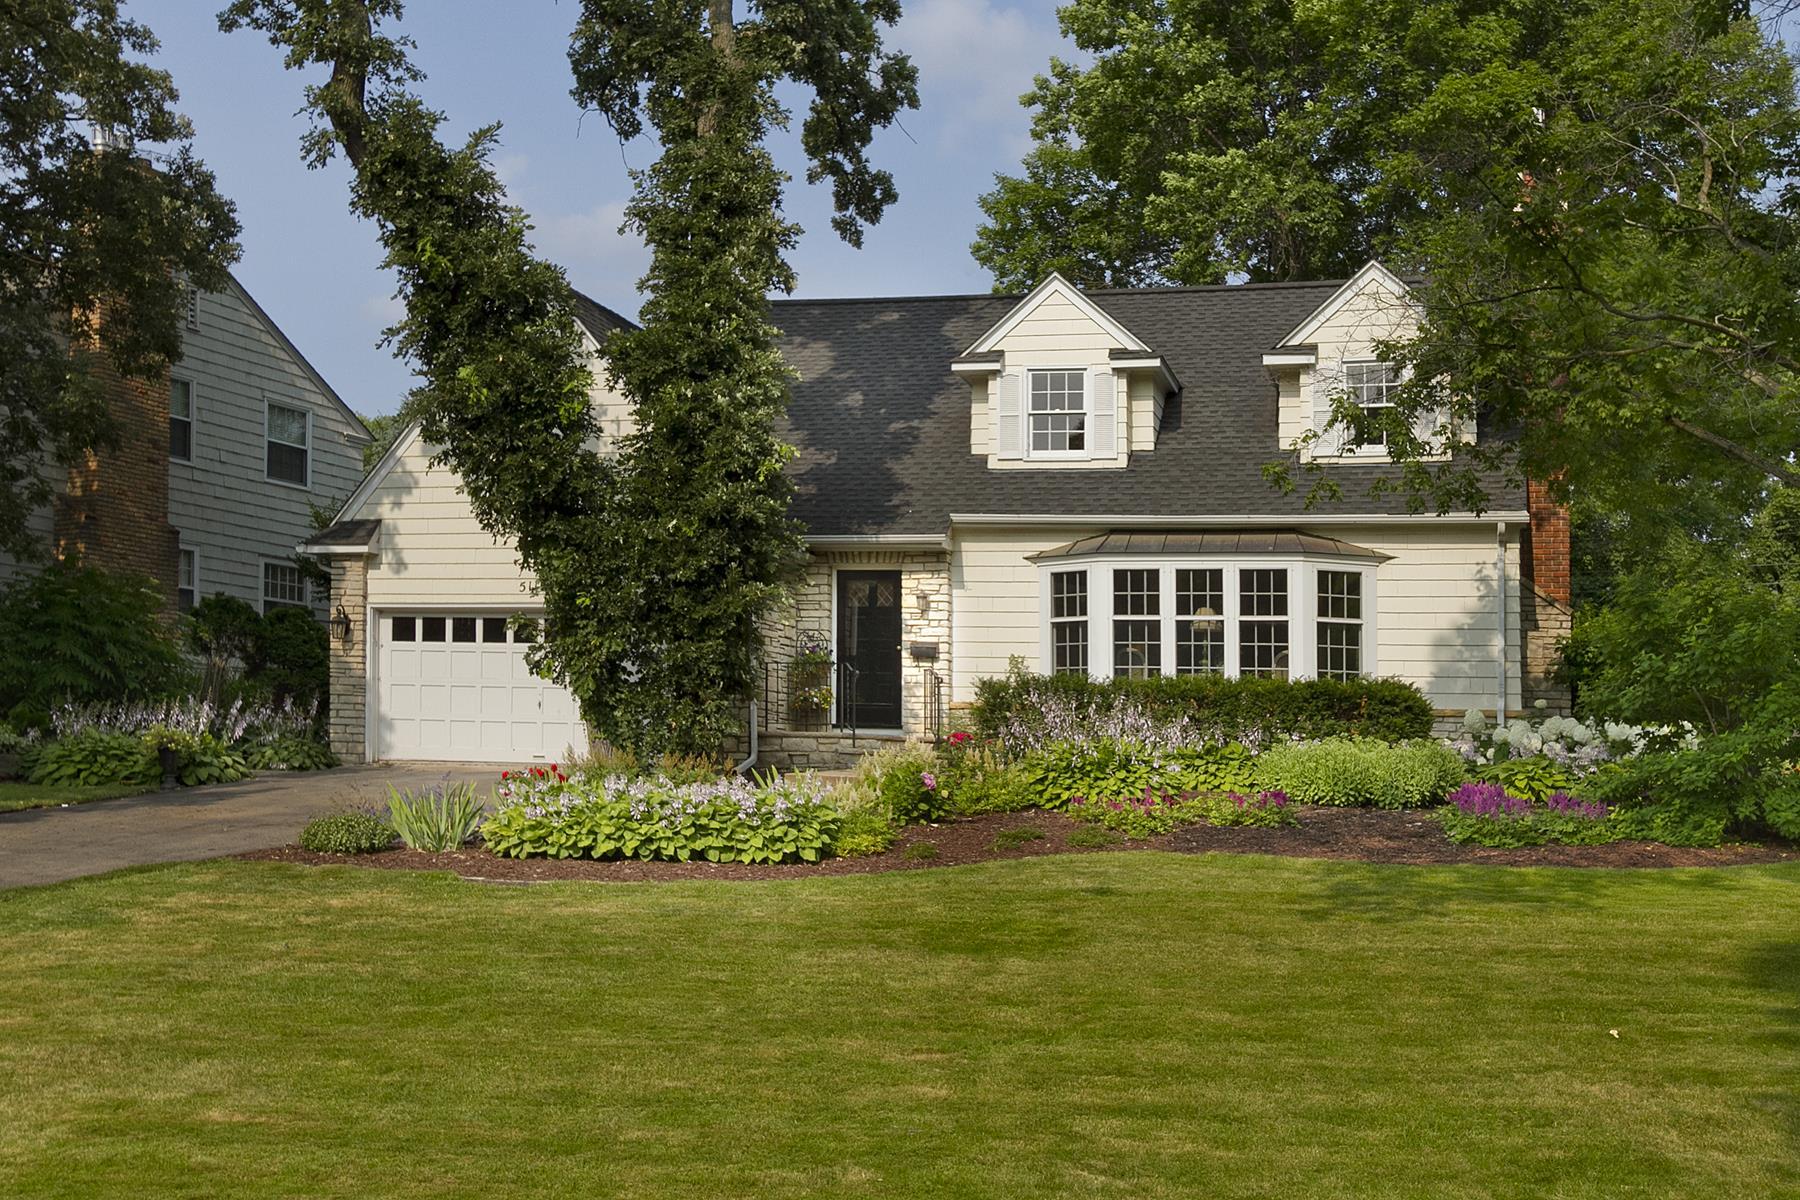 Single Family Home for Sale at 5115 Arden Avenue Edina, Minnesota 55424 United States